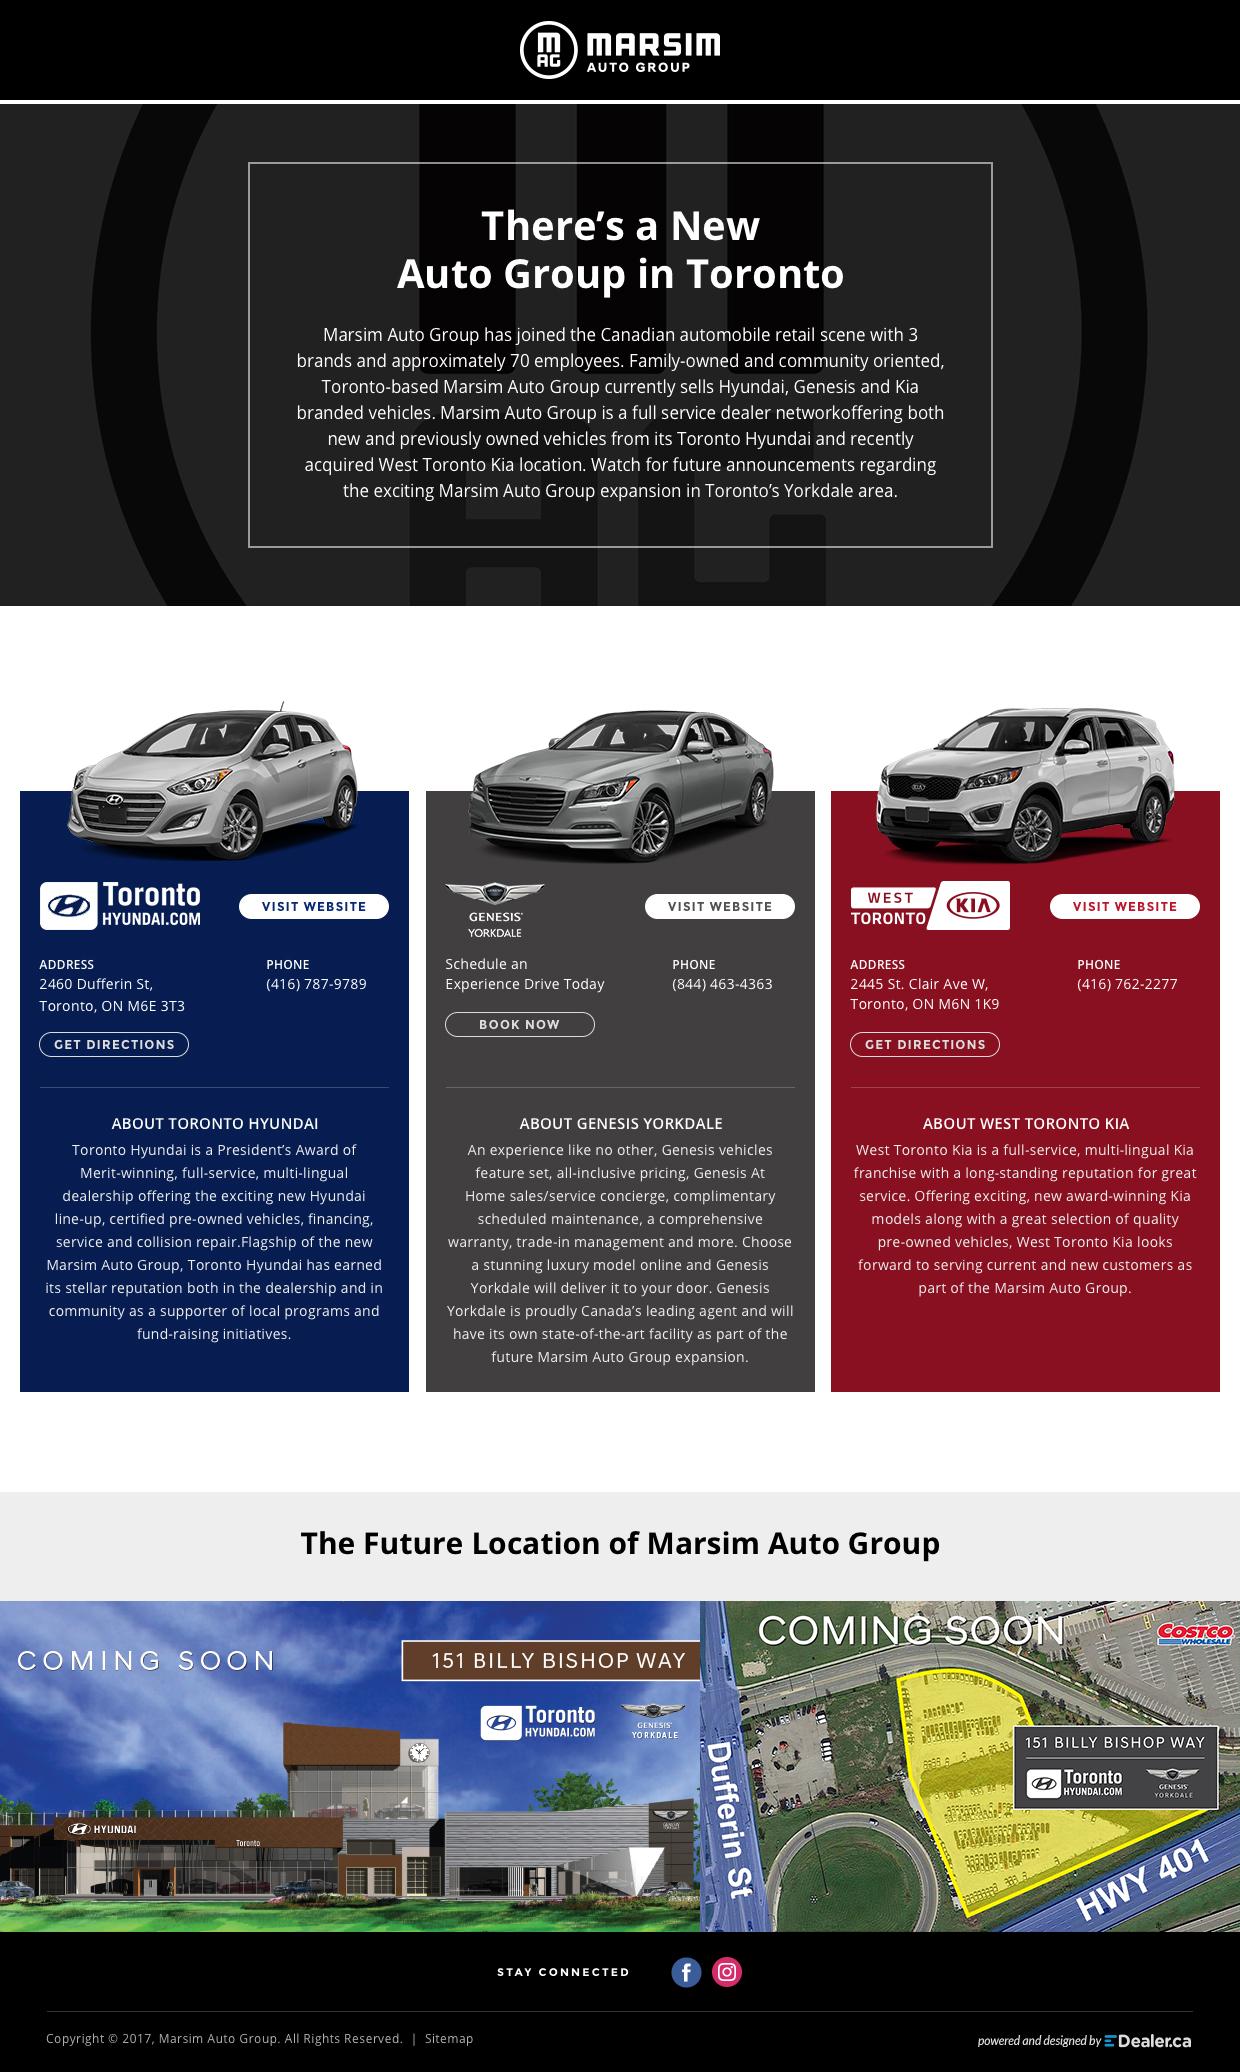 Marsim Auto Group